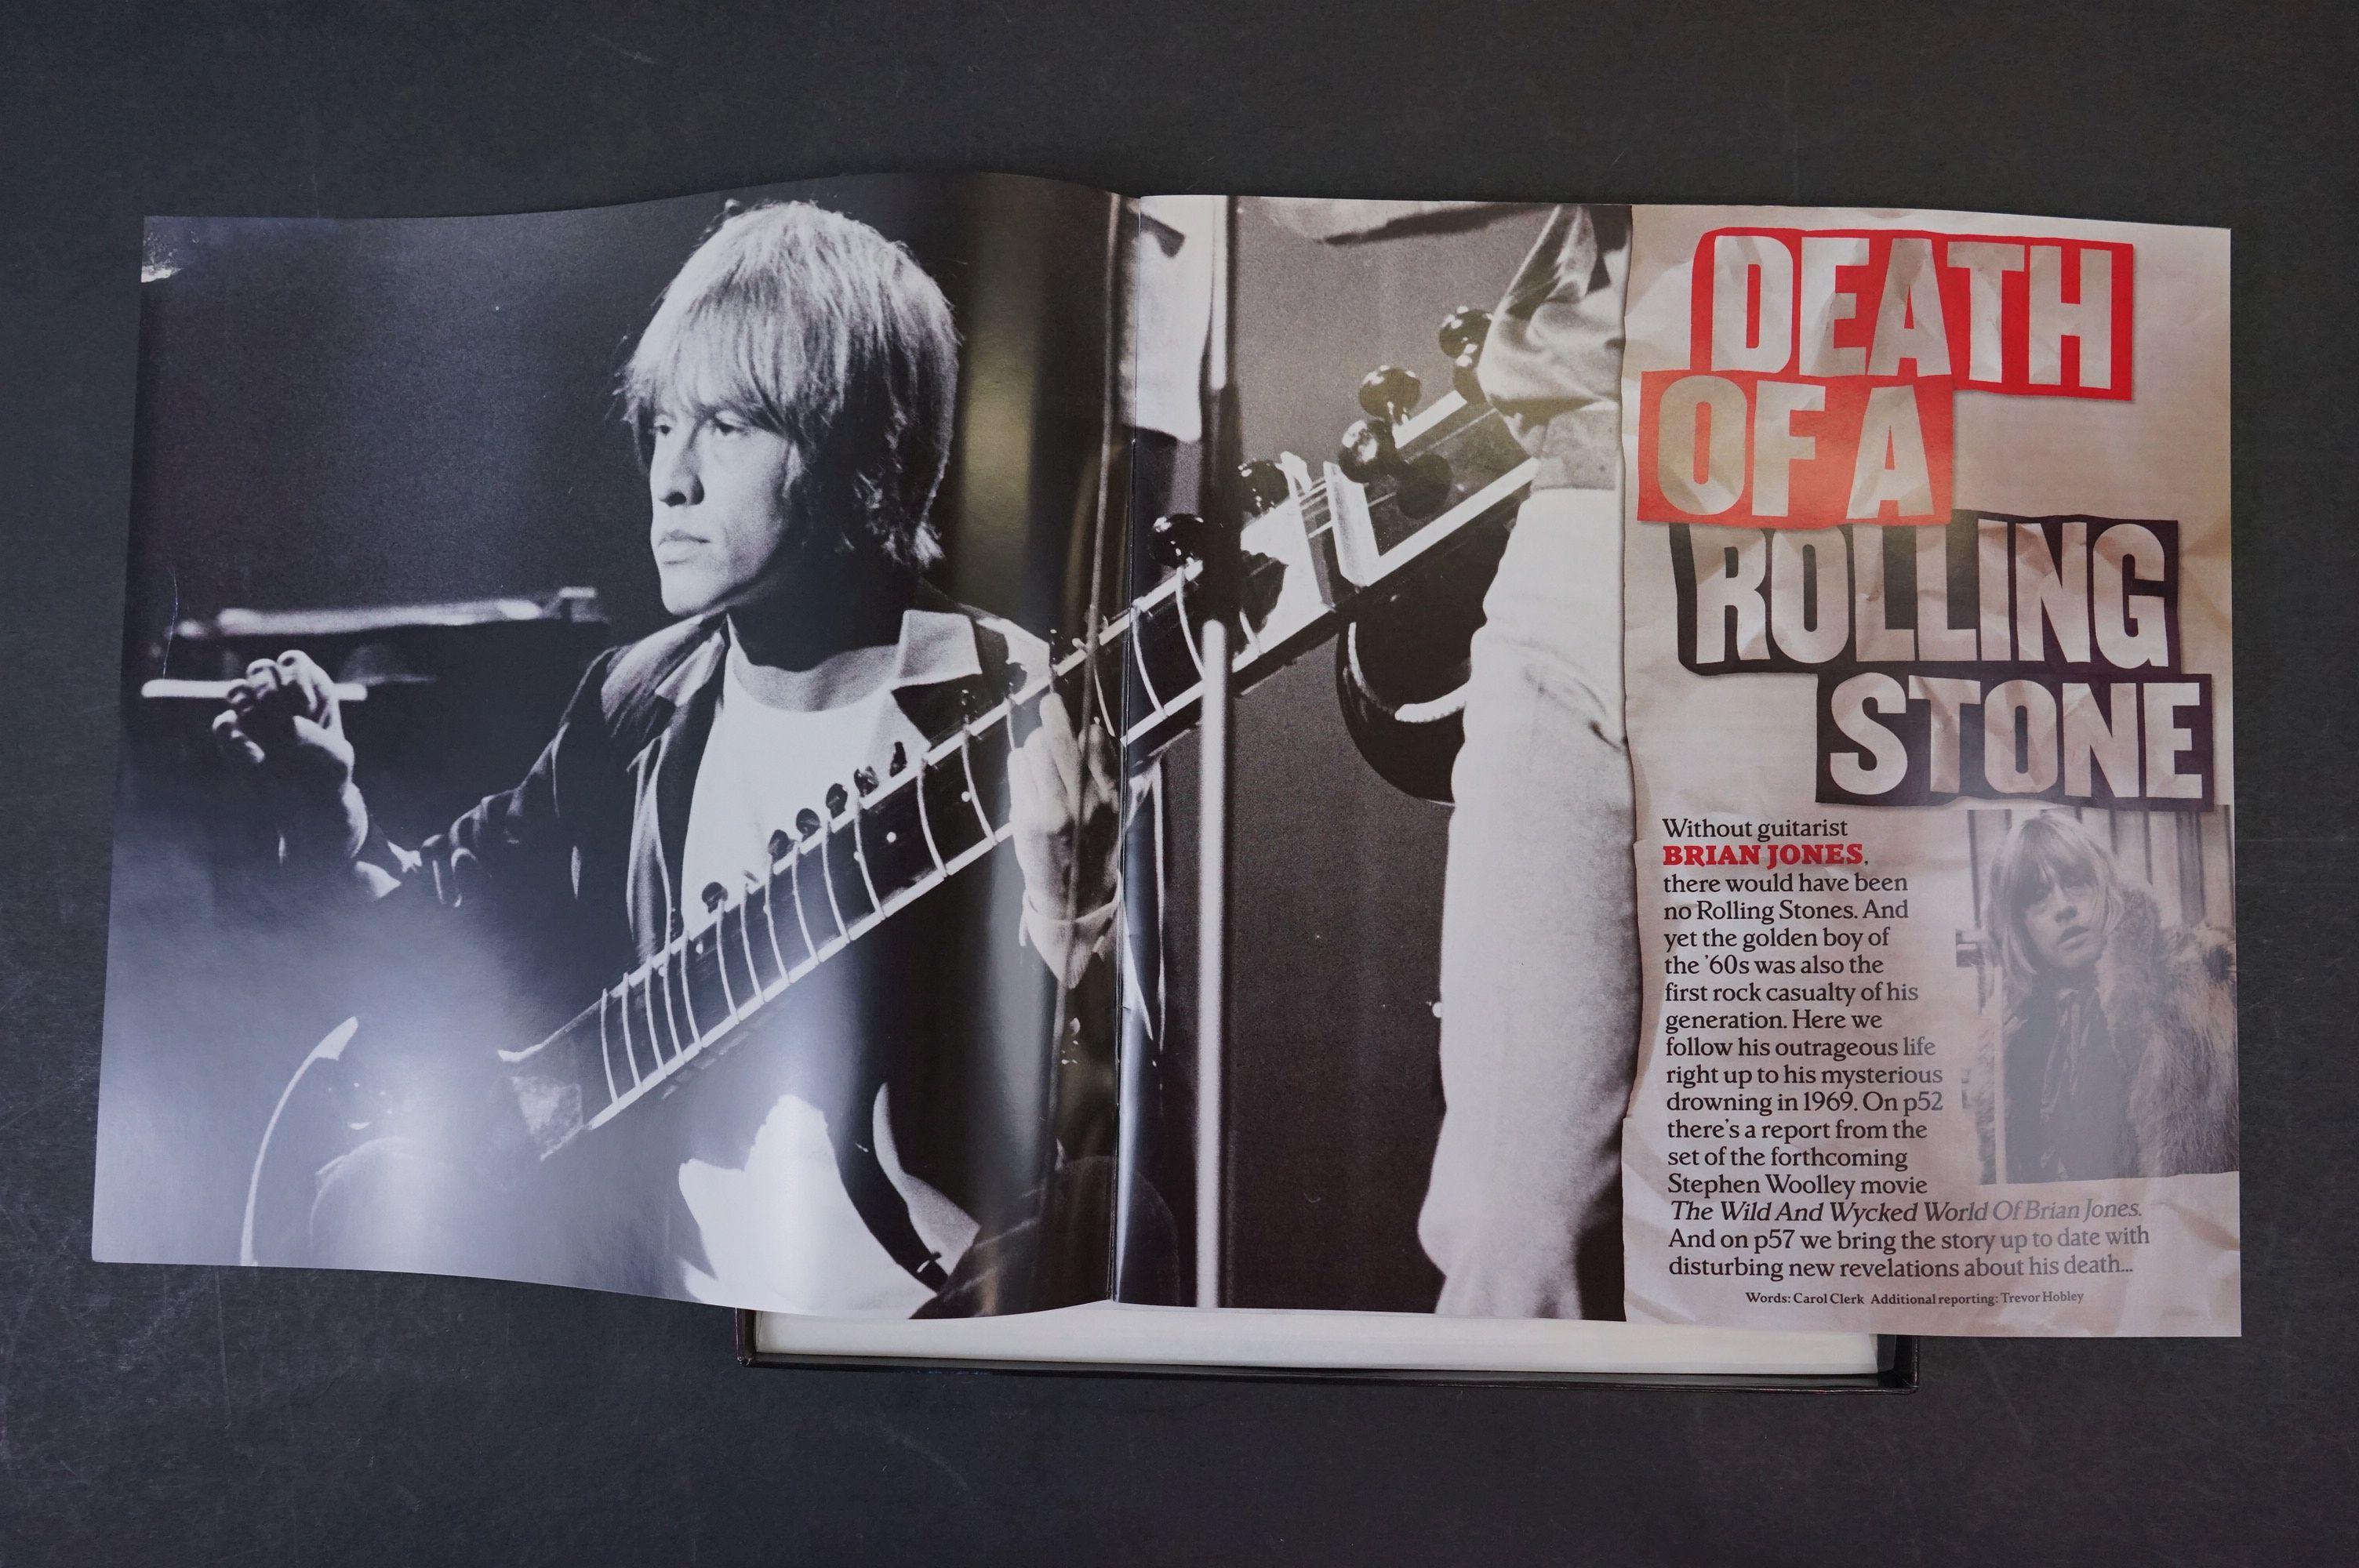 Vinyl - ltd edn The Rolling Stones The Brian Jones Years 5 LP / 3 CD Box Set RTR019, heavy - Image 4 of 12